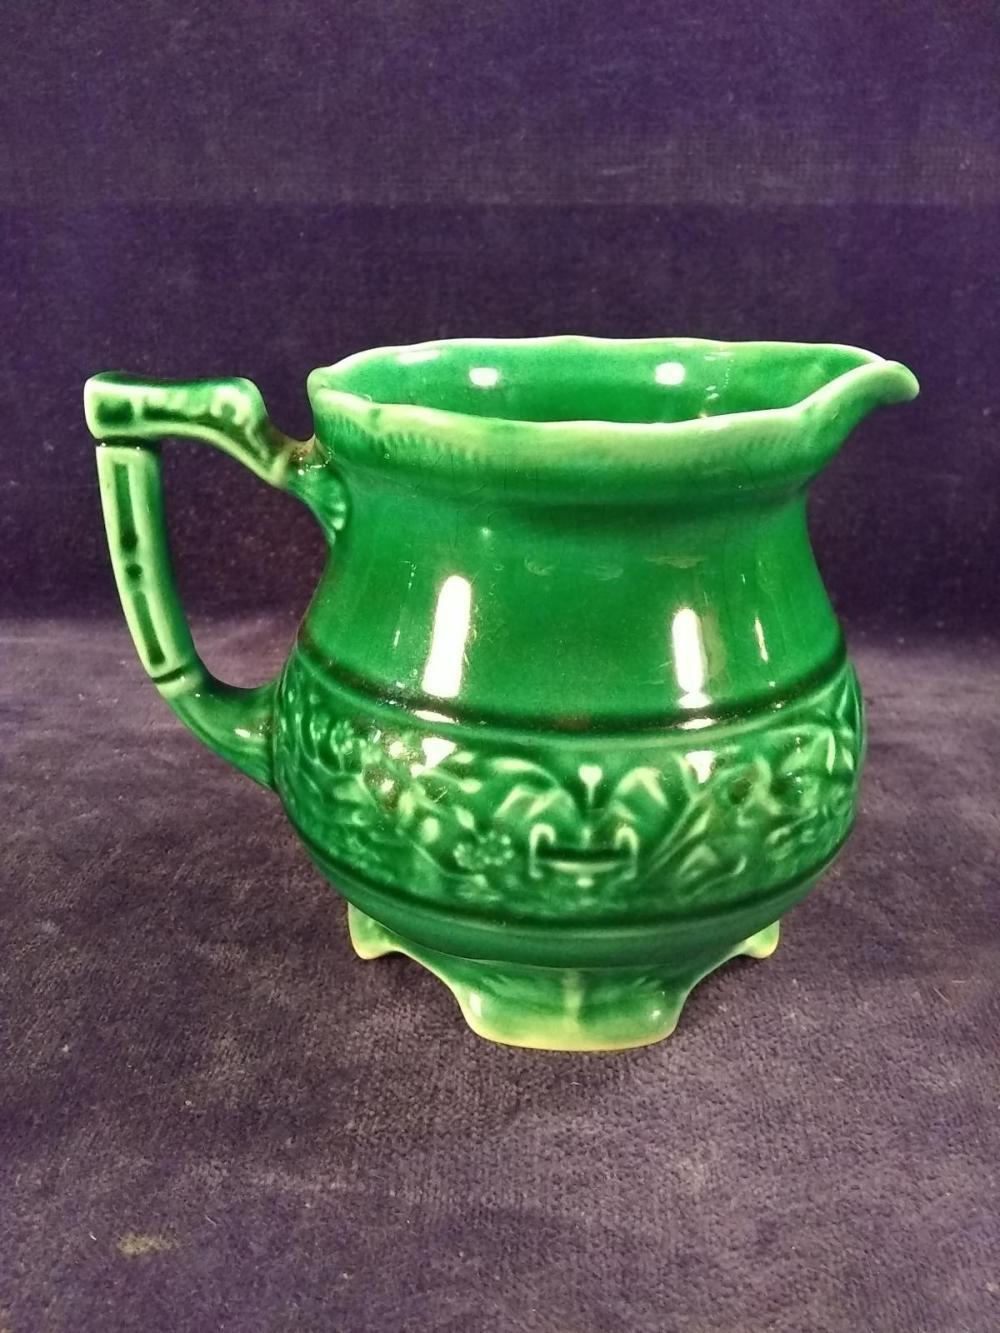 Antique USA Green Glazed Pitcher